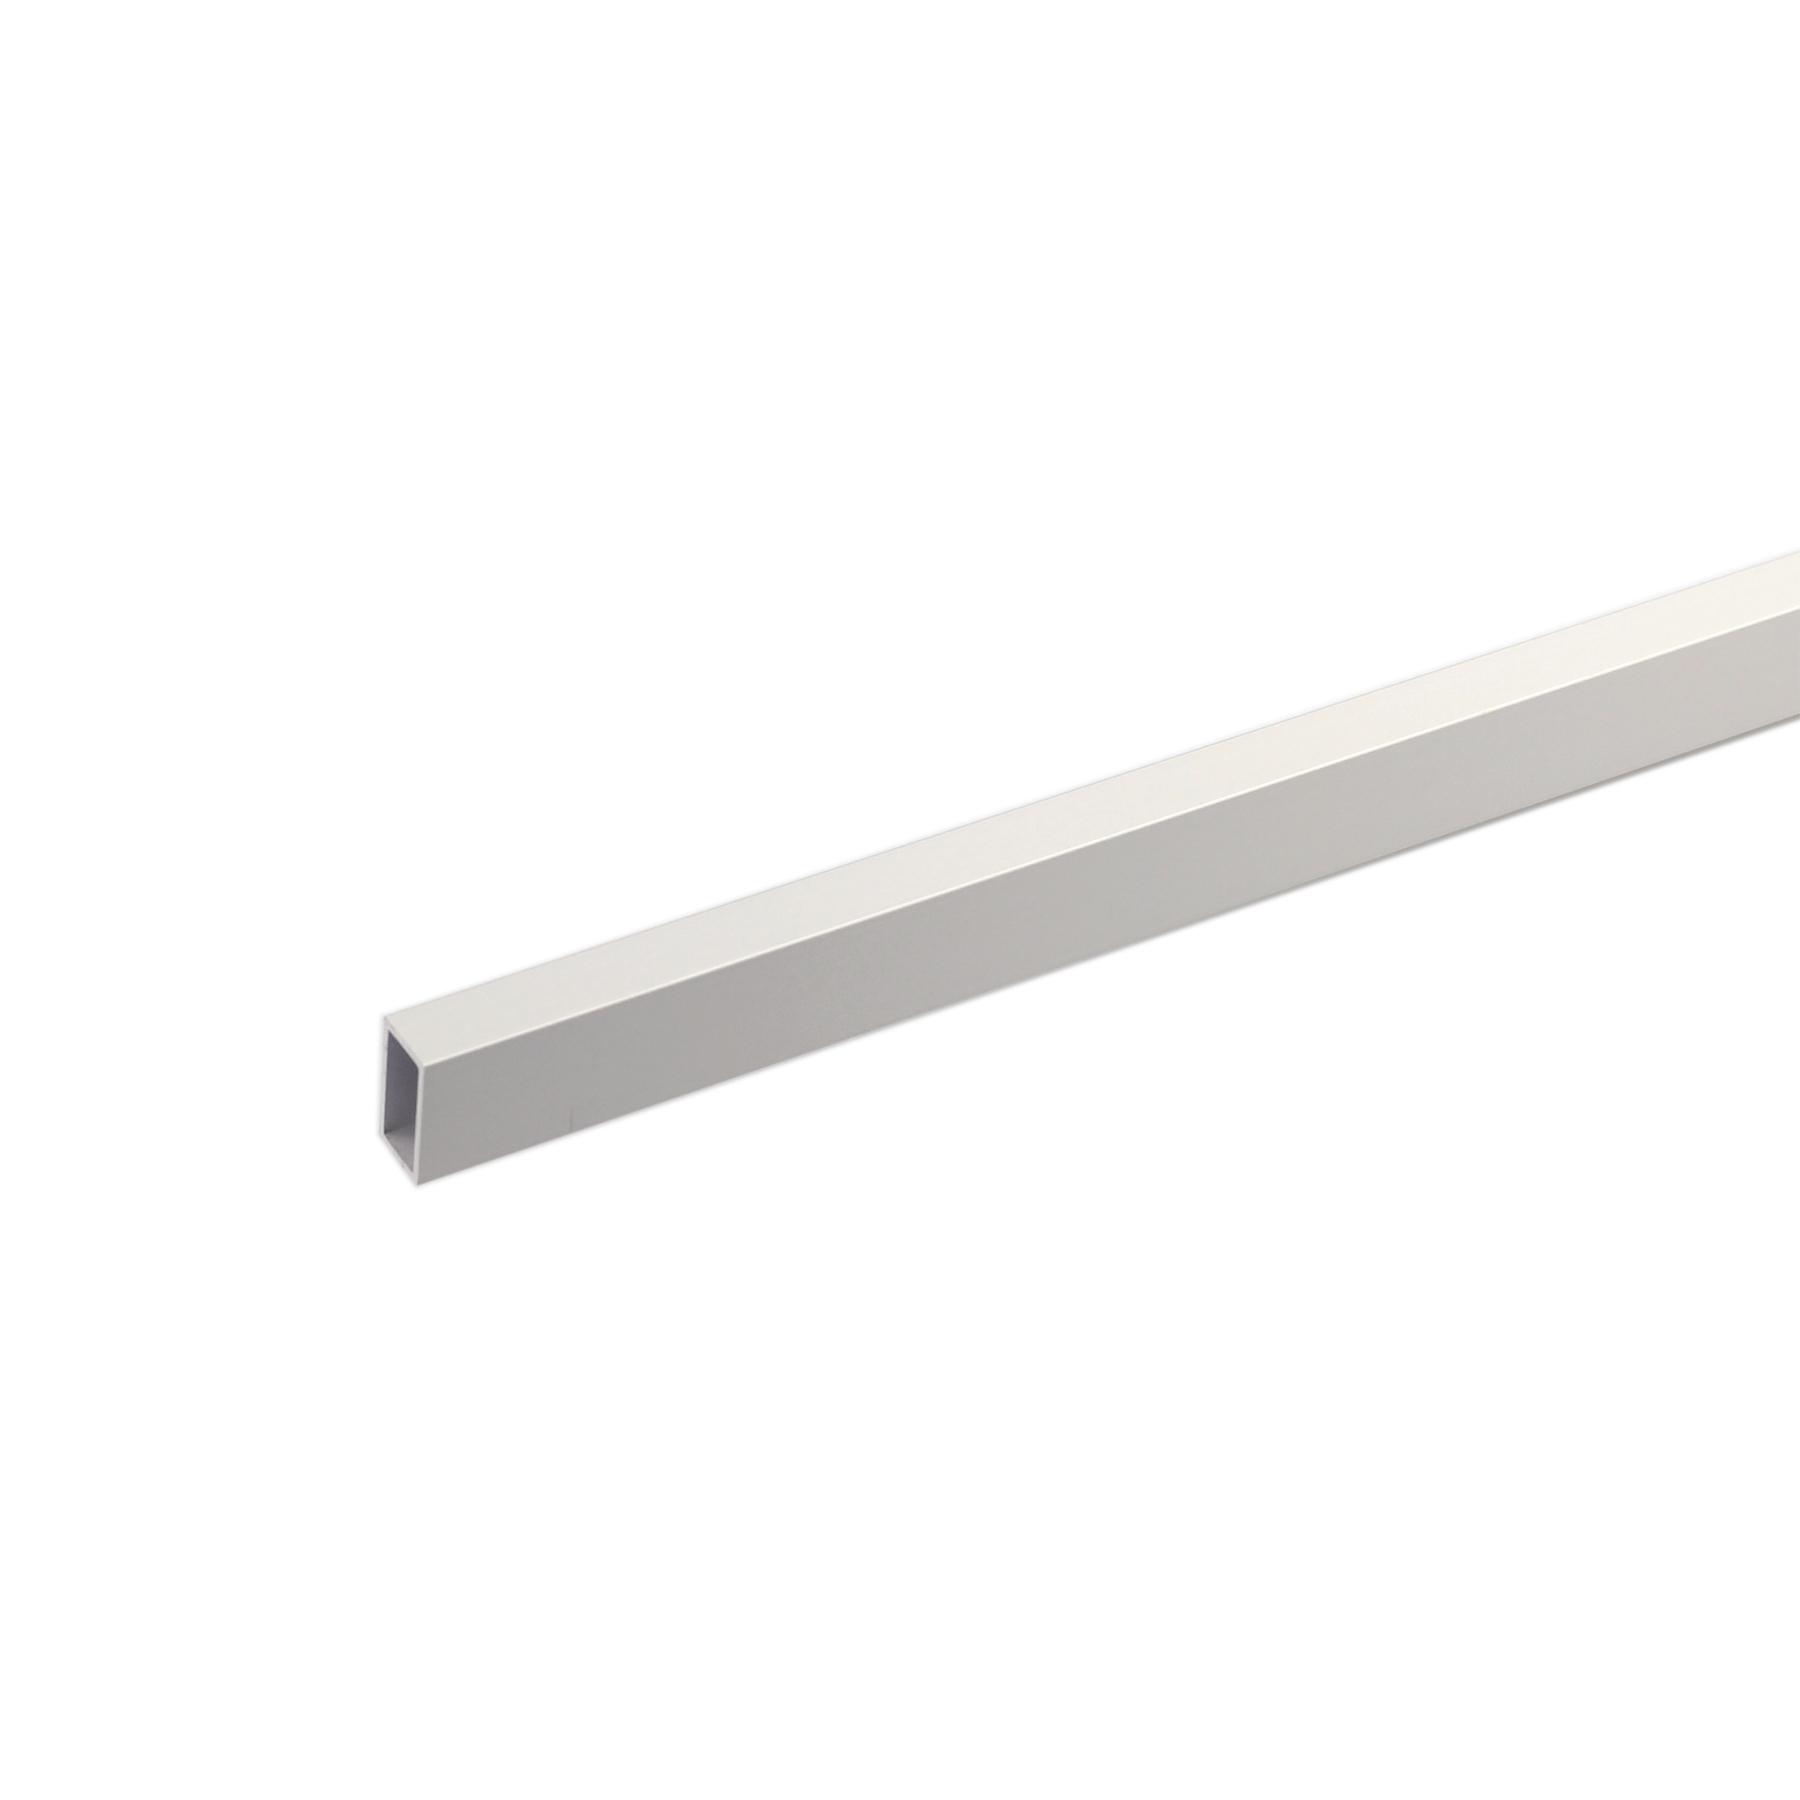 Perfil alum nio tubo retangular 1mx40x20mm anodizado - Perfil aluminio leroy merlin ...